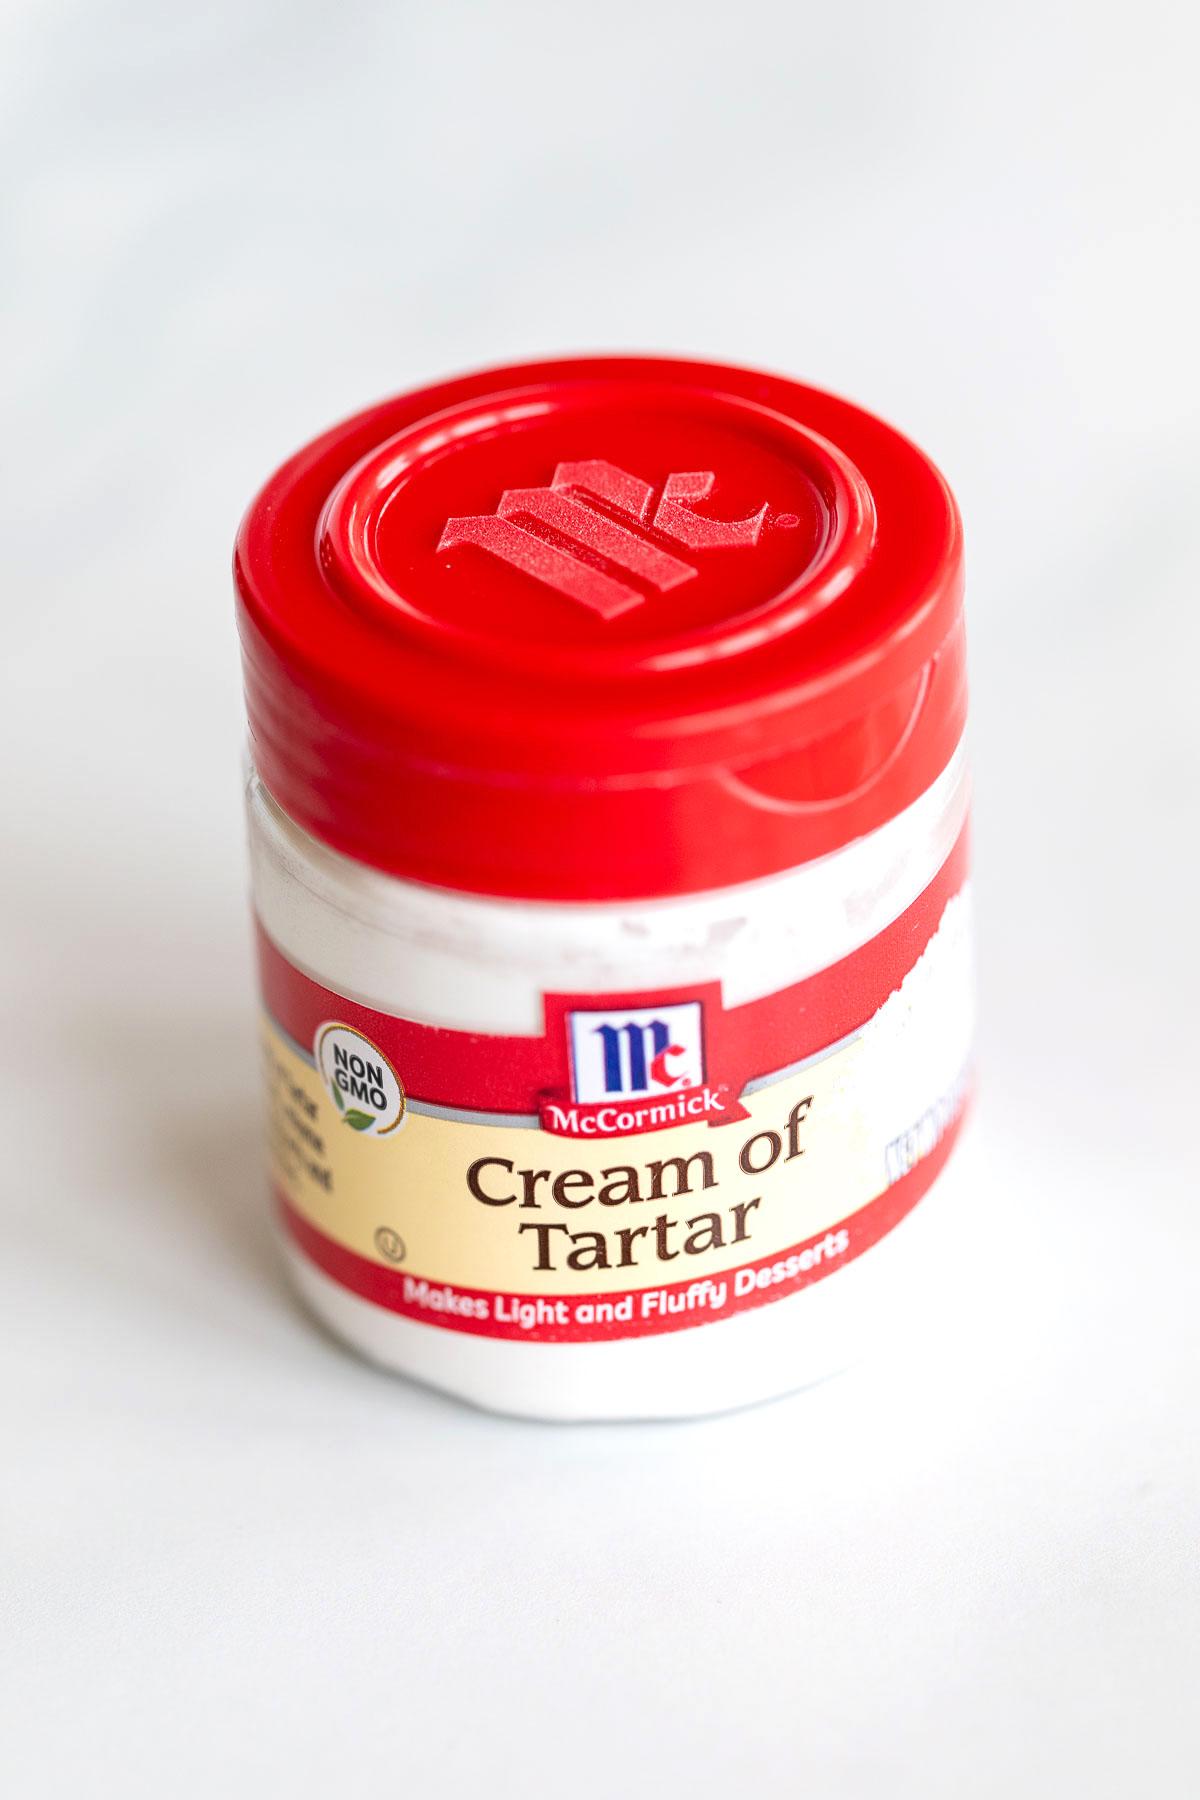 cream of tartar in packaging